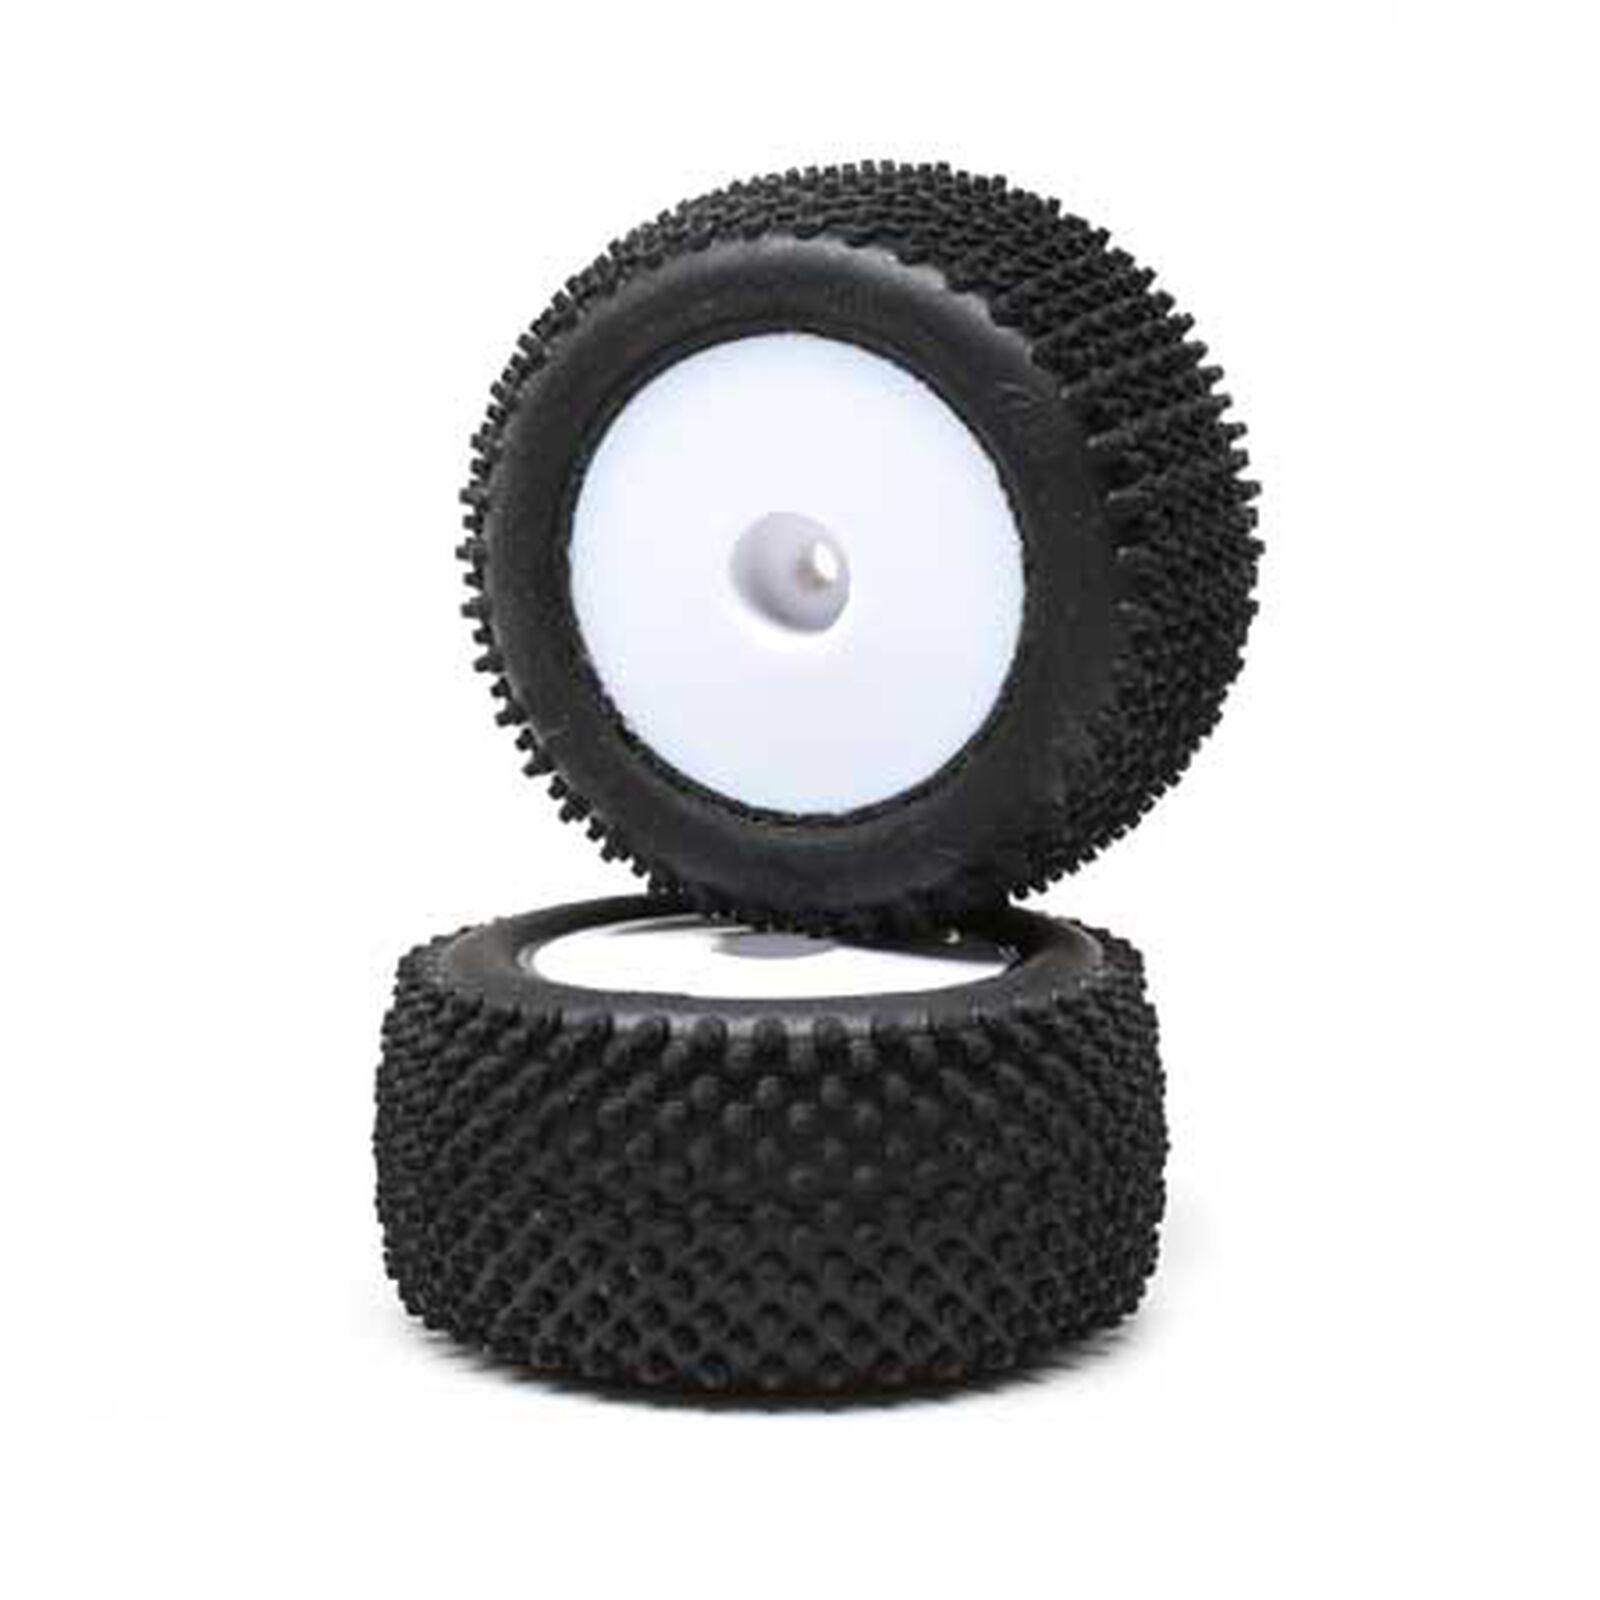 Pin Tires, Rear, Mounted, White (2): Mini-T 2.0